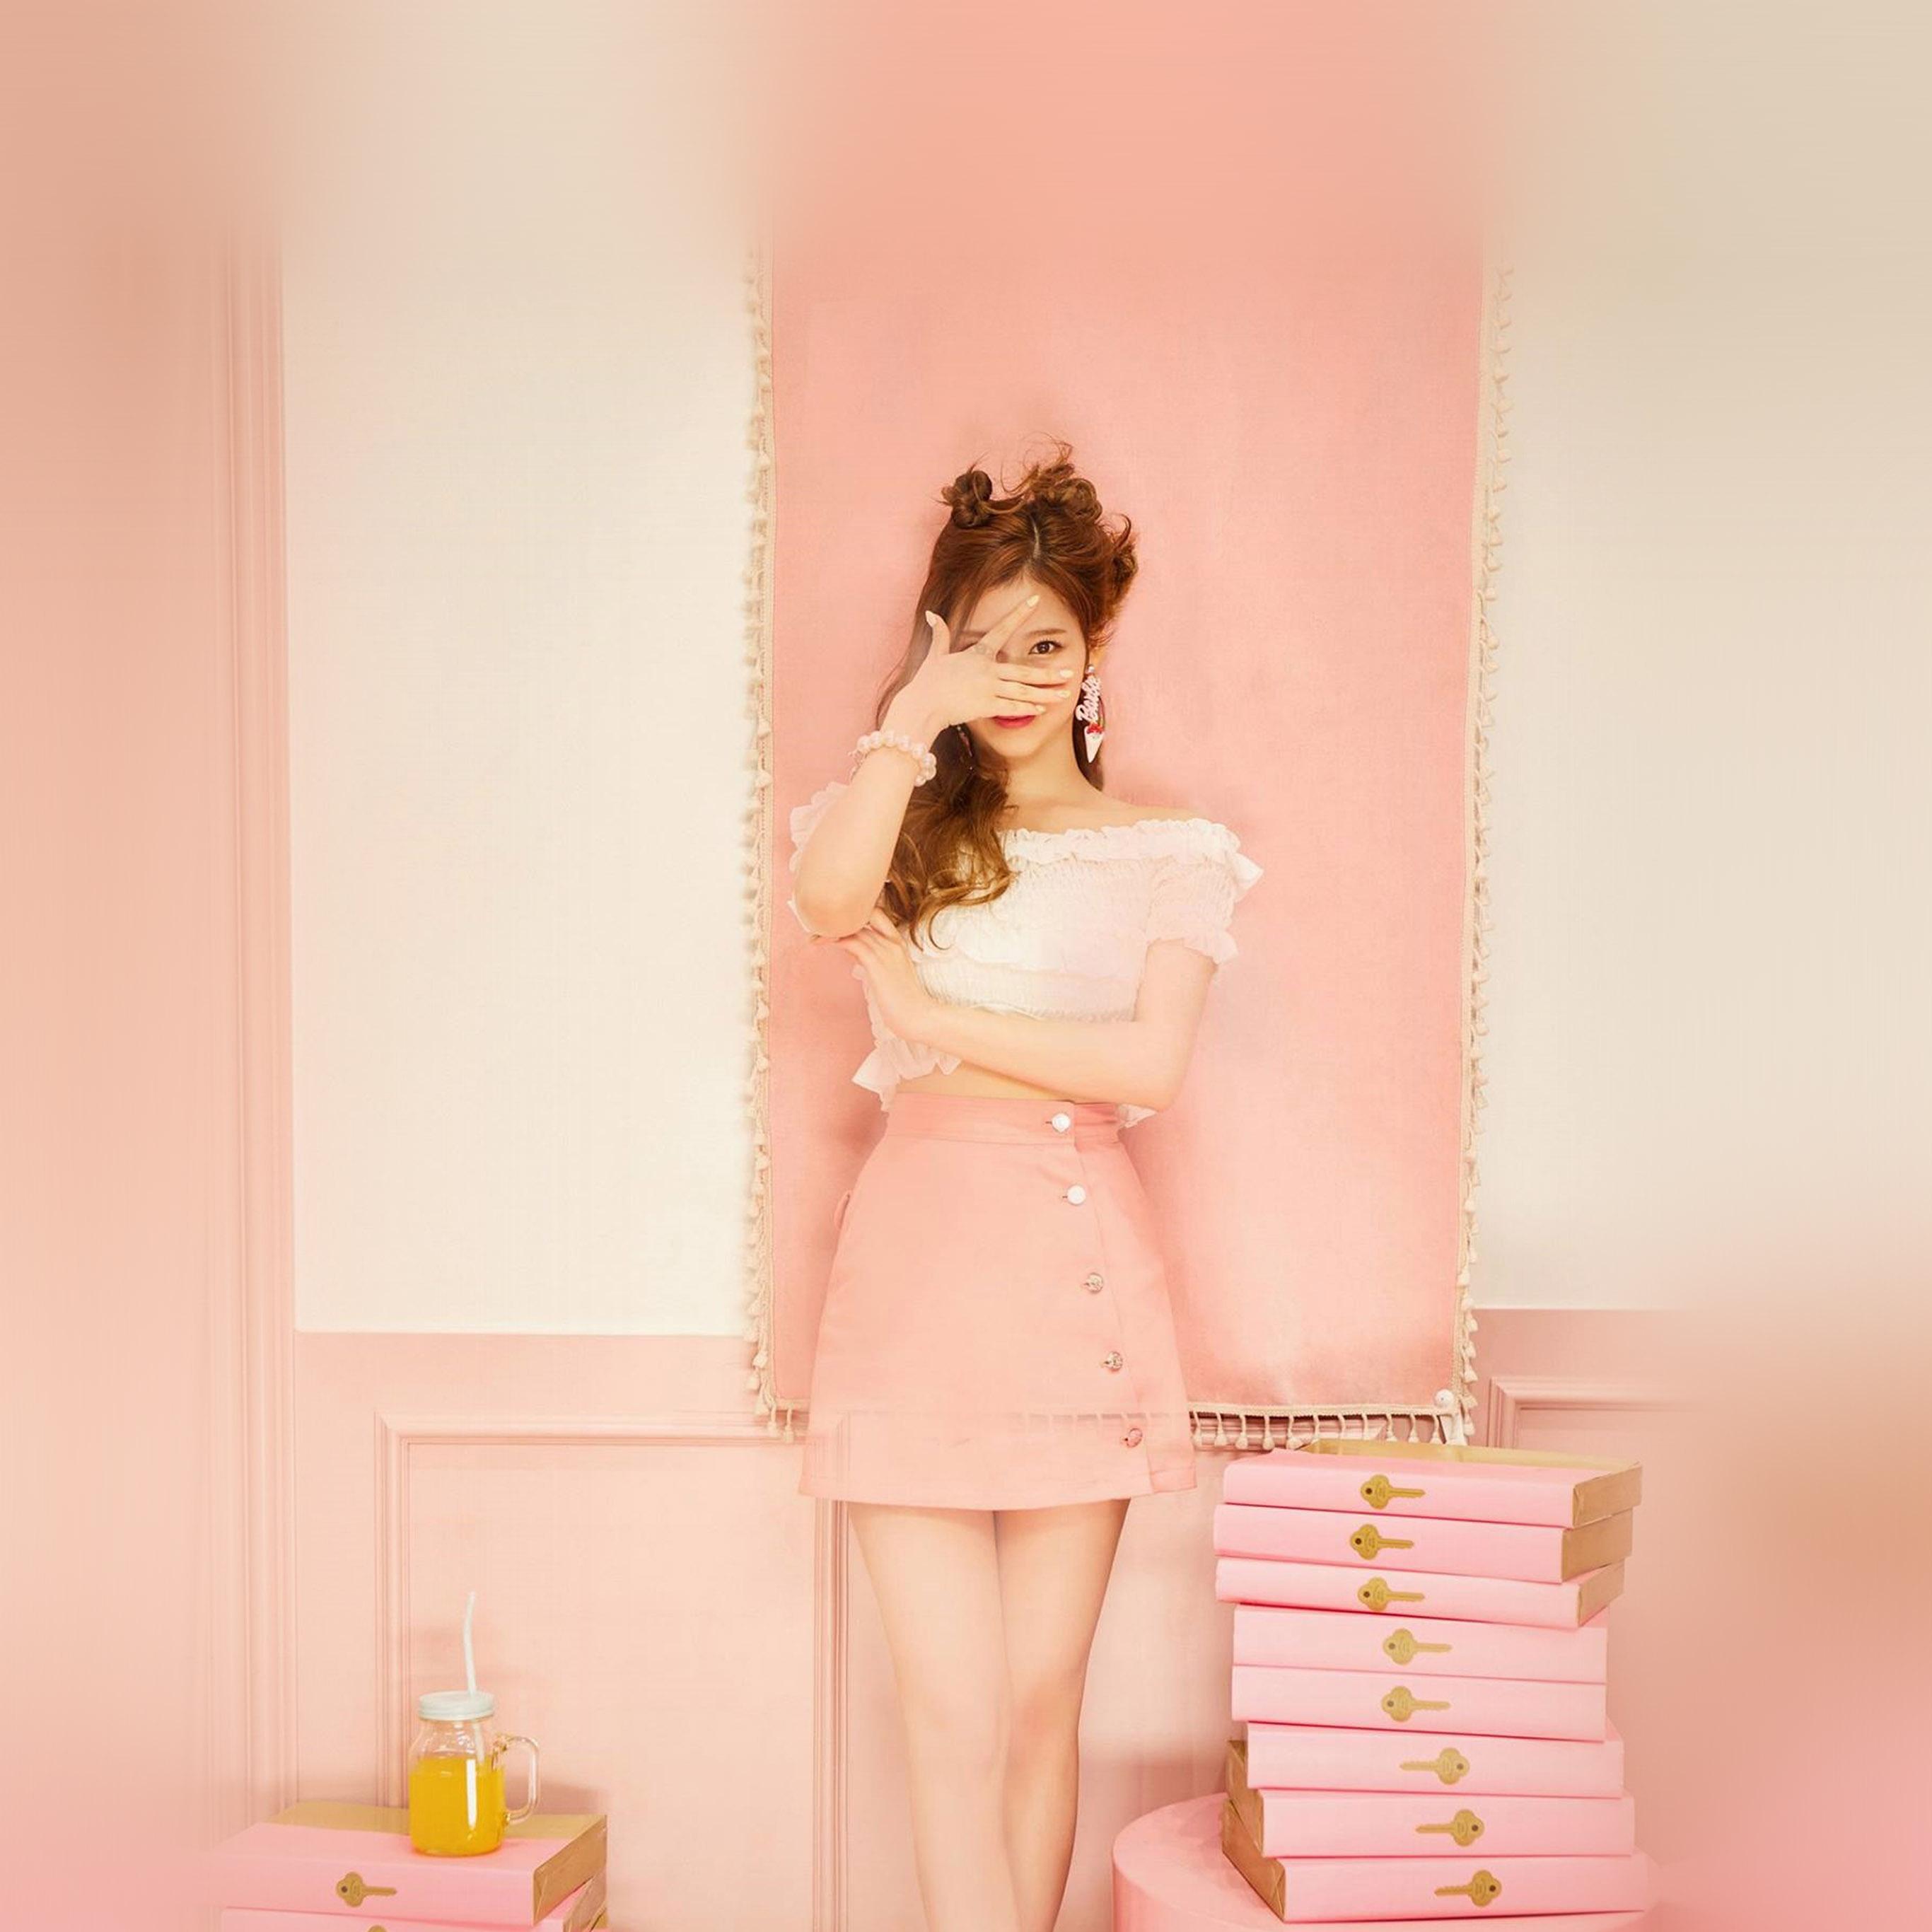 Car Stickers Wallpapers Hn12 Sana Girl Twice Kpop Cute Pink Wallpaper